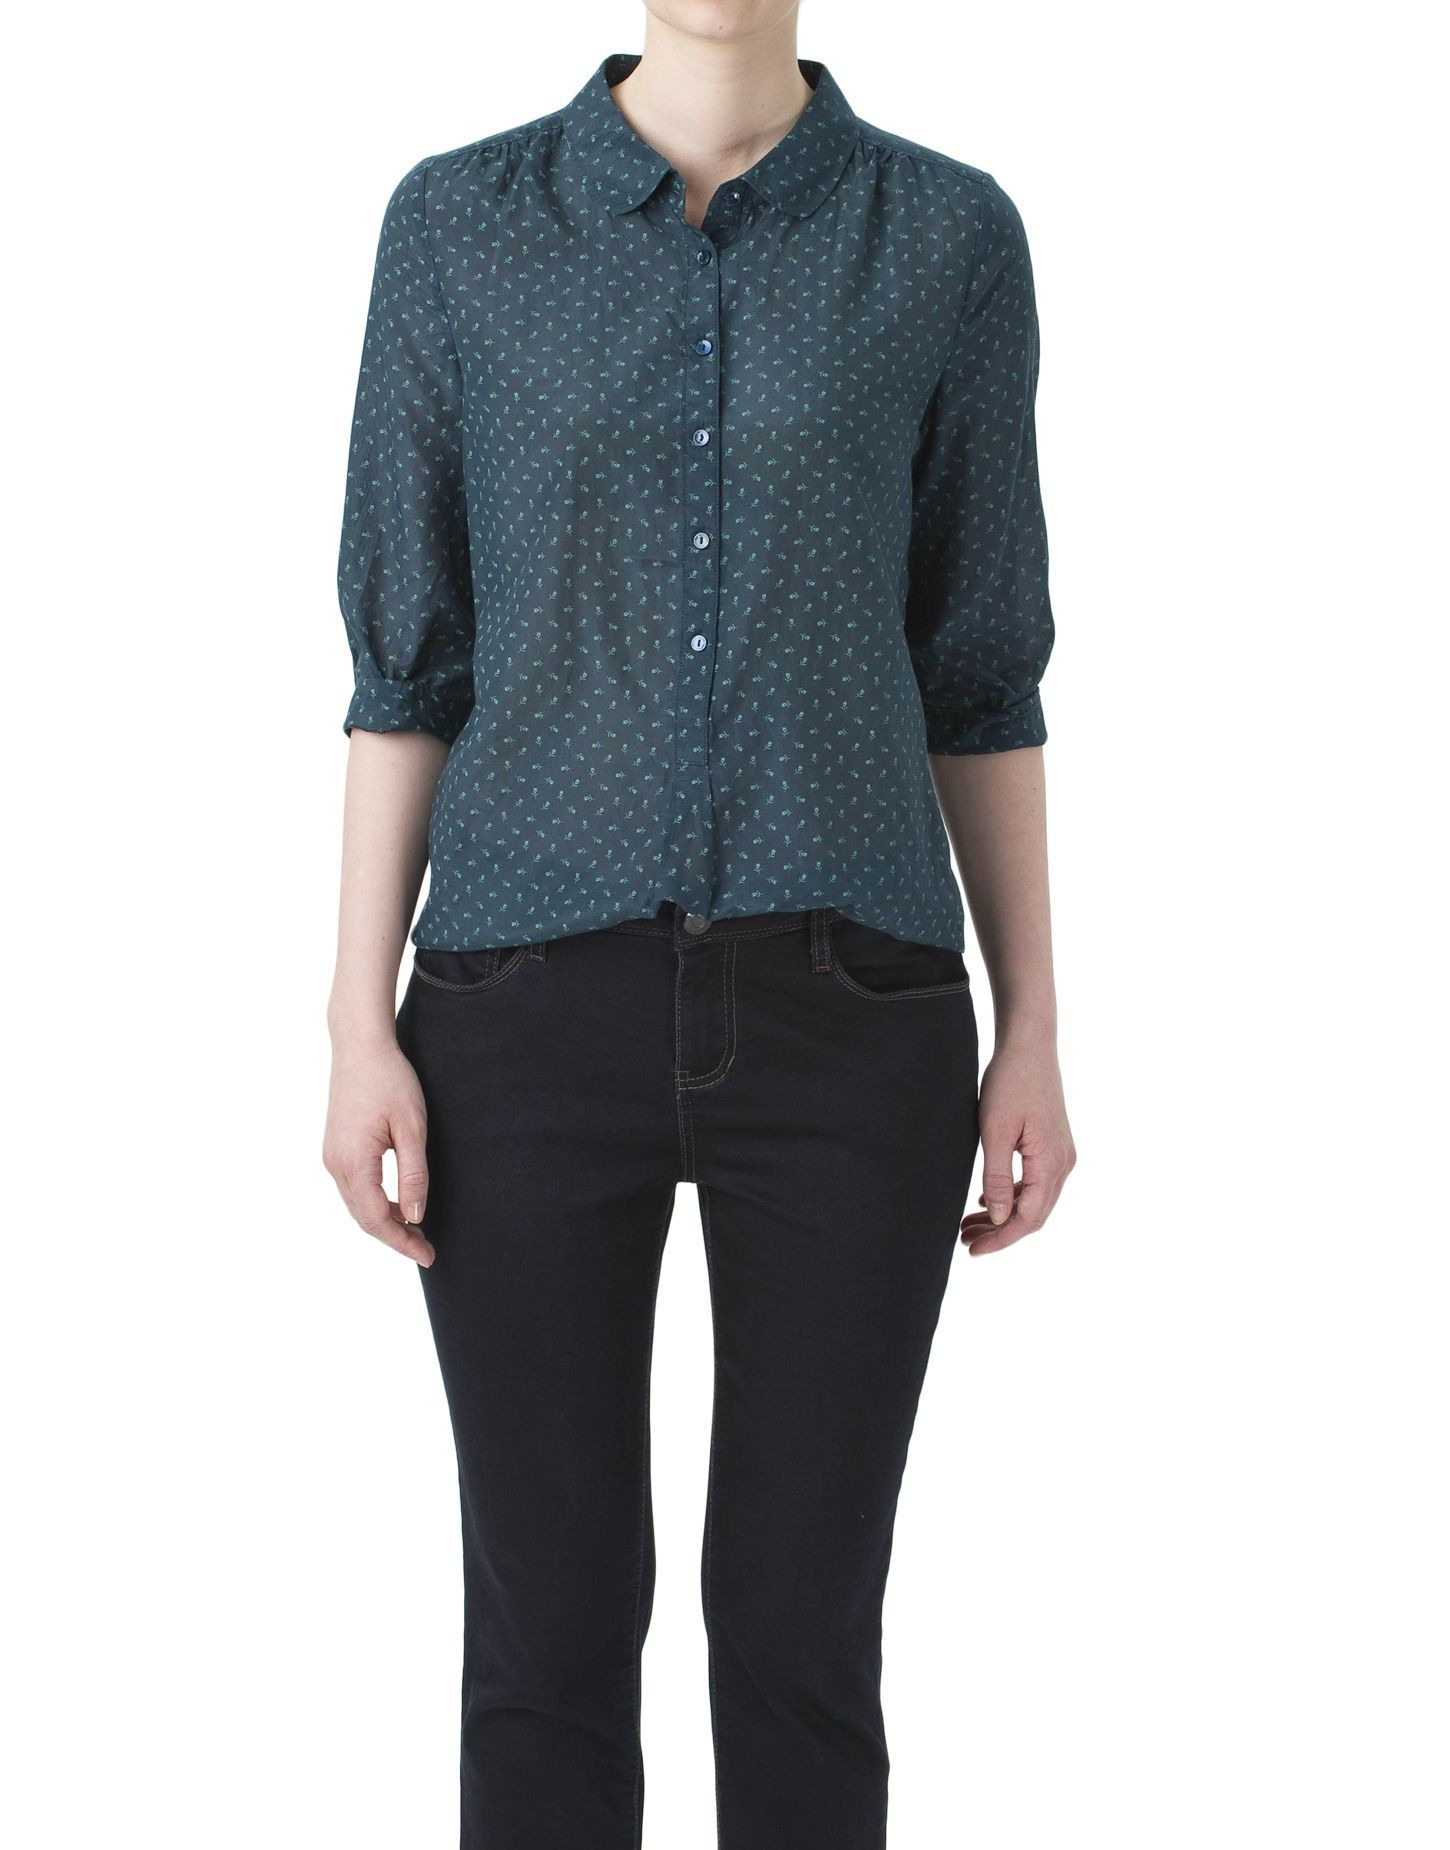 Blouses Opus  Kleidung Online Kaufen Modestil